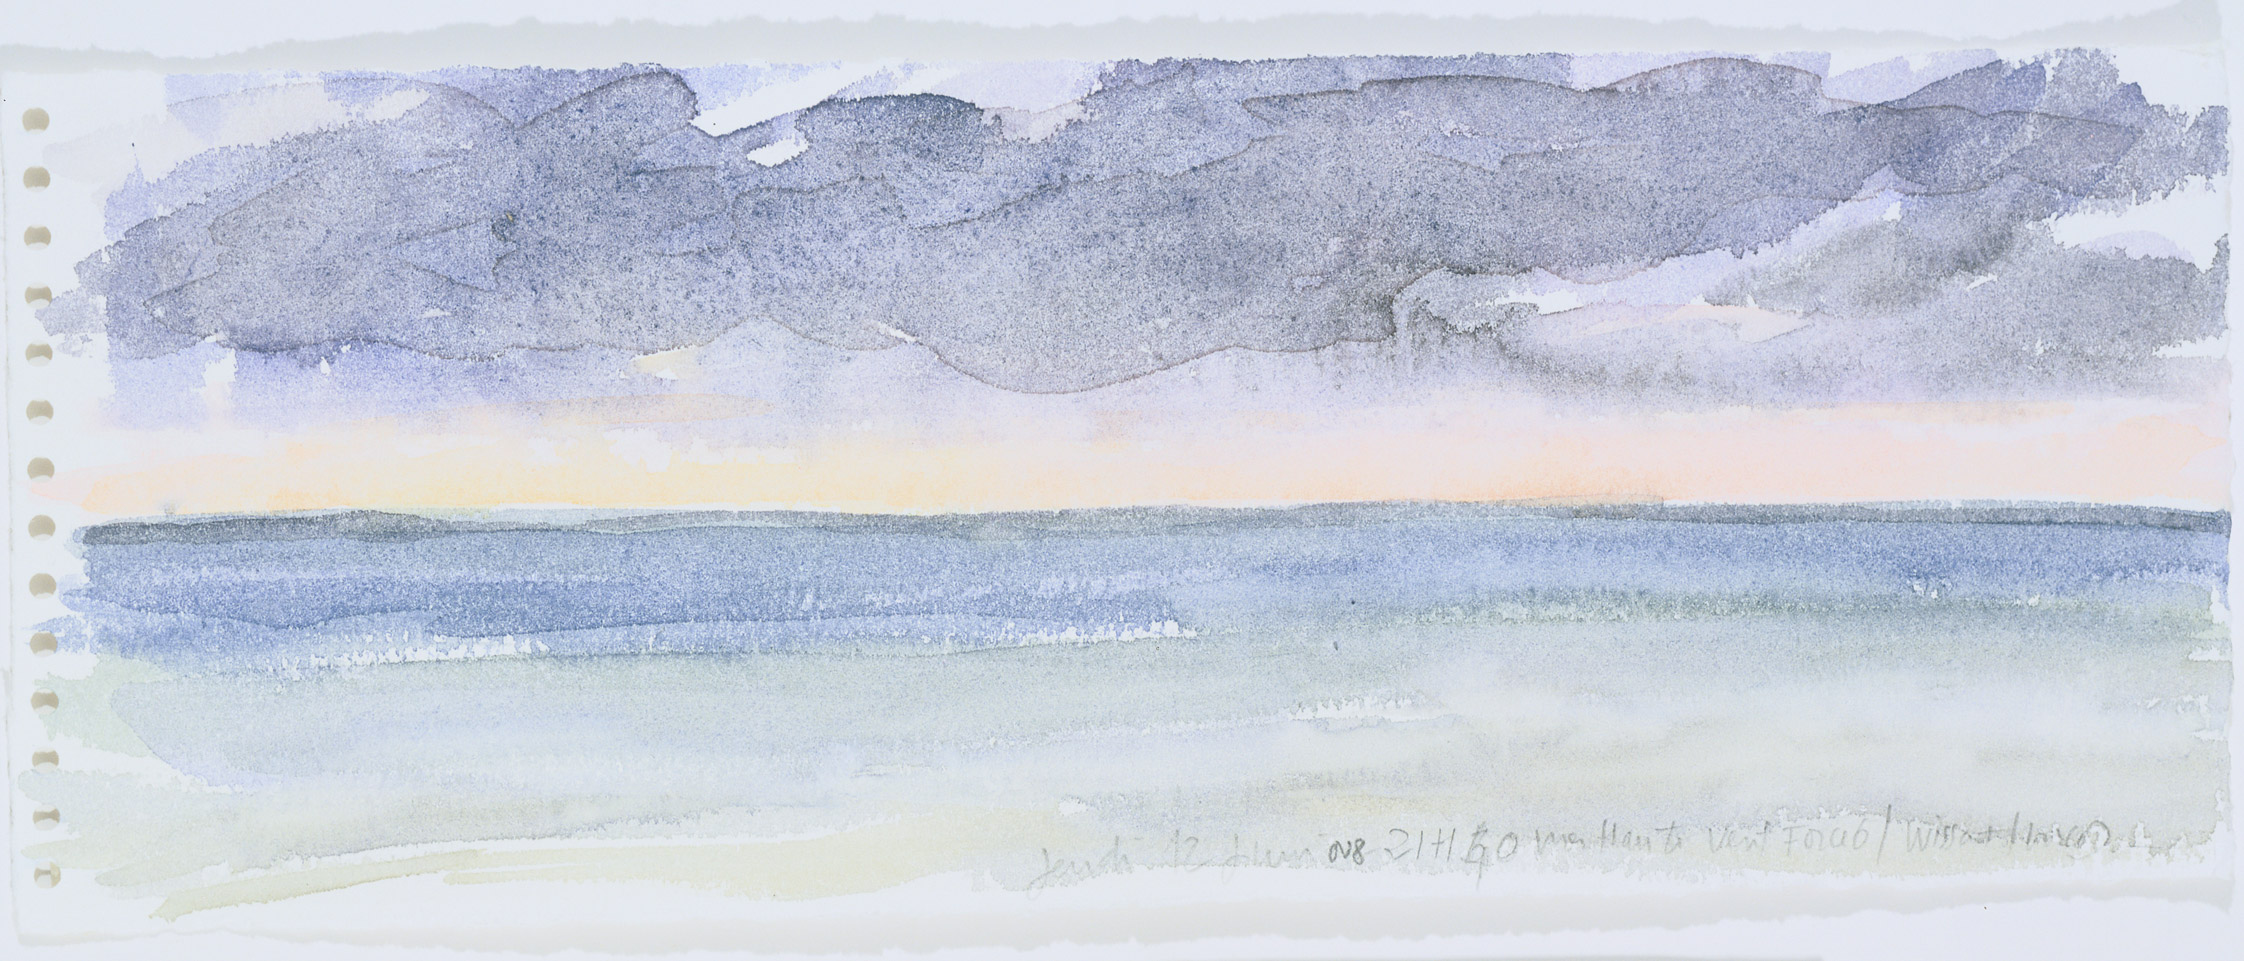 21 h 40, mer haute, vent force 6, 2008